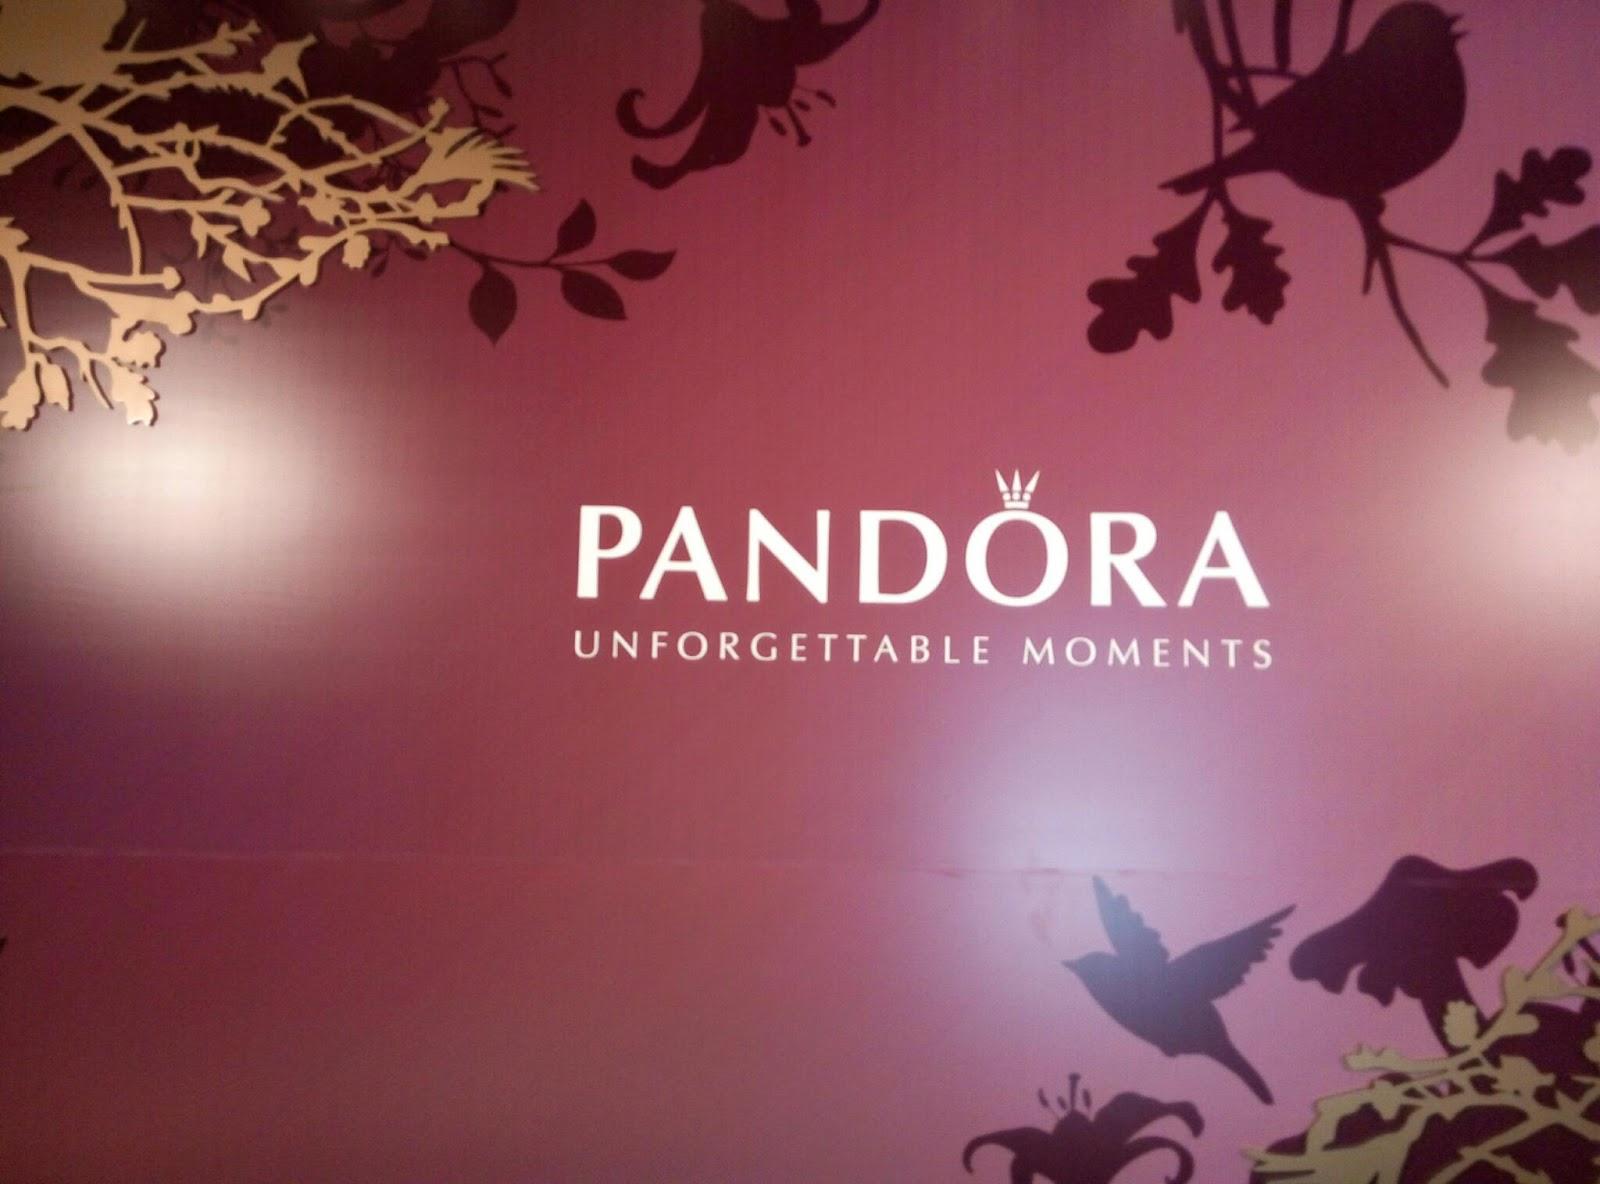 Harga Dan Spek Lion Star Mangkok Bowl Mw 3 Pink Termurah 2018 Tanabe Sustec Pro Gf Suspension Kit Honda Jazz Ge8 2008 2013 Pandora Launches Autumn Winter 2015 Collection Hkblogger